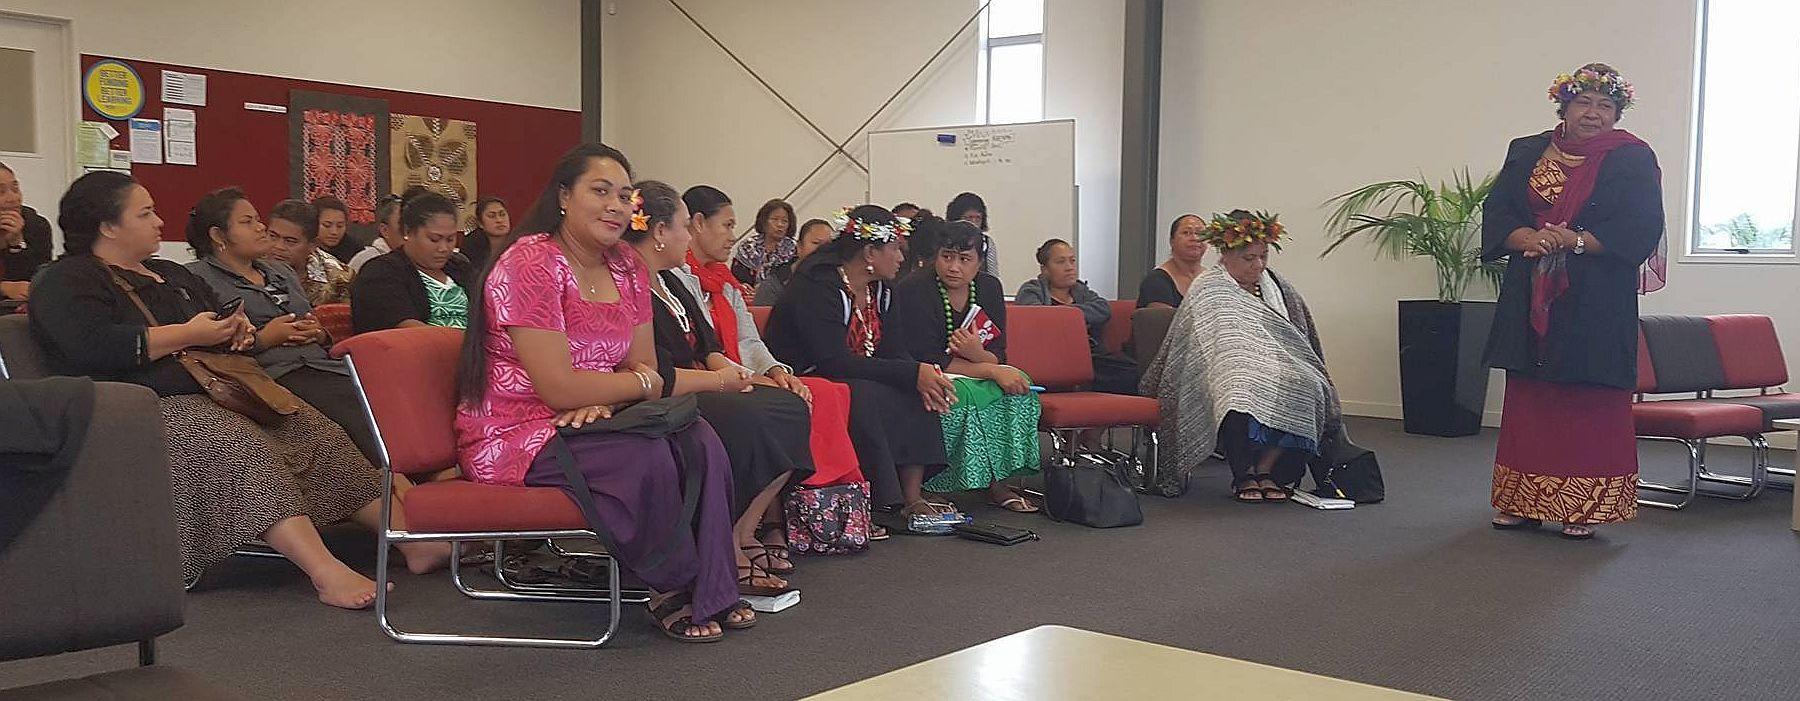 Co-principals and teachers from Samoa Primary School visiting Kia Aroha College.